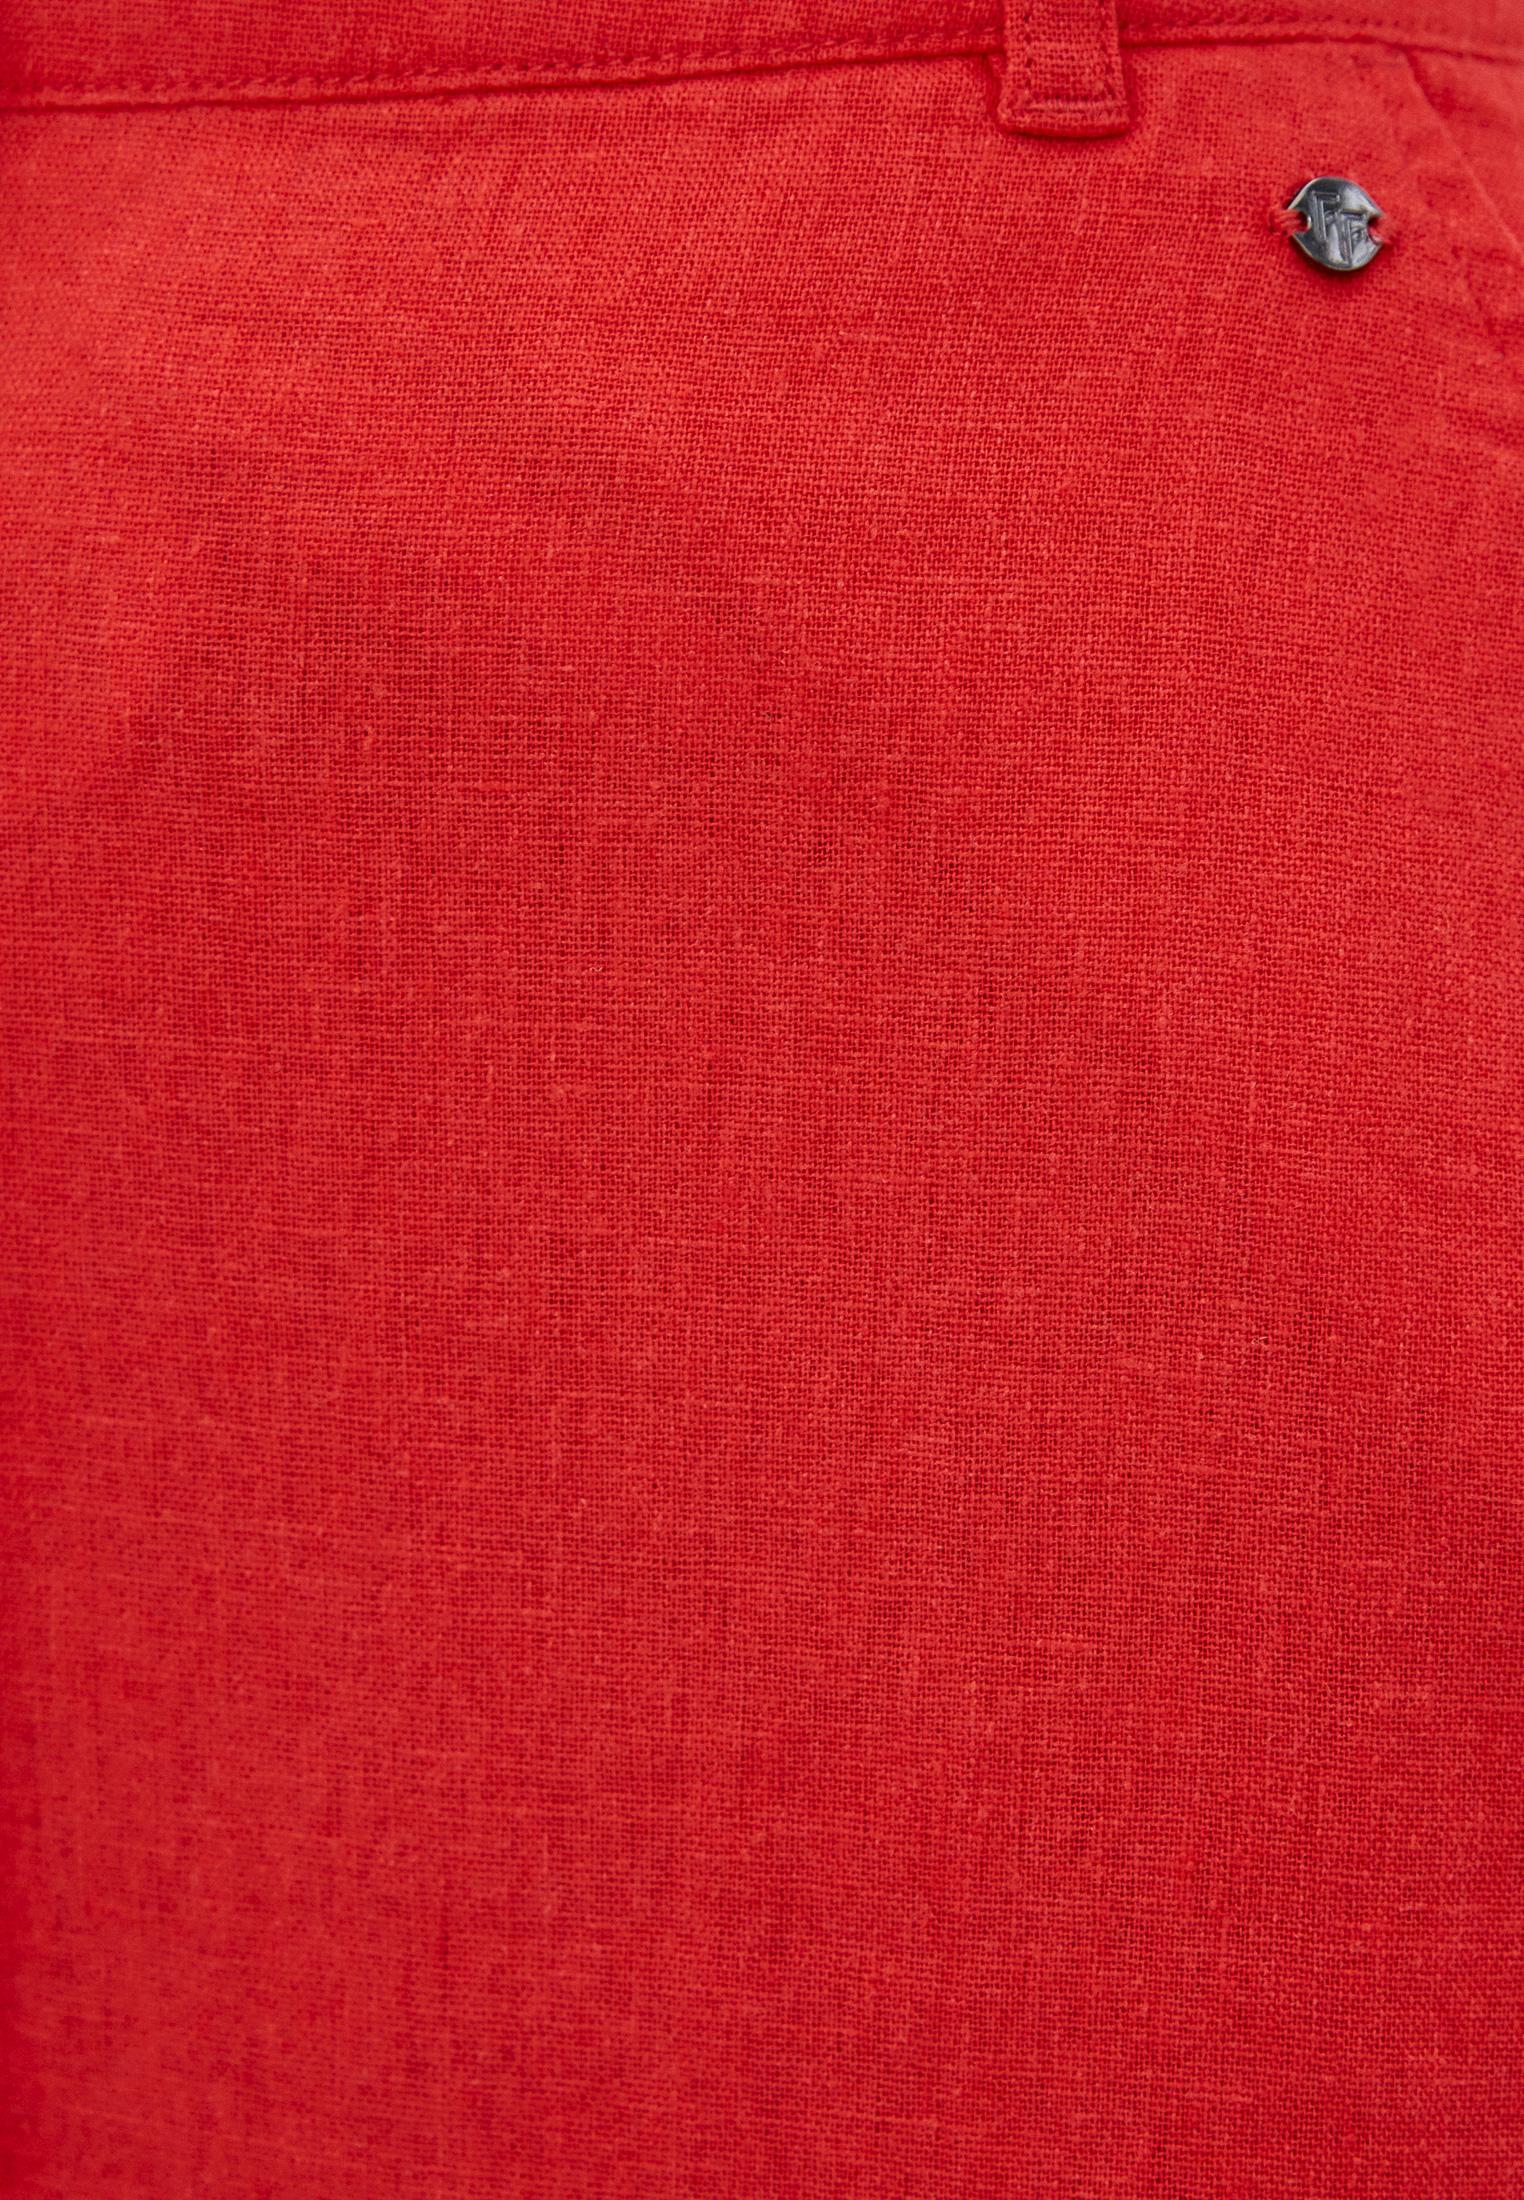 Прямая юбка Finn Flare (Фин Флаер) S19-14081: изображение 4